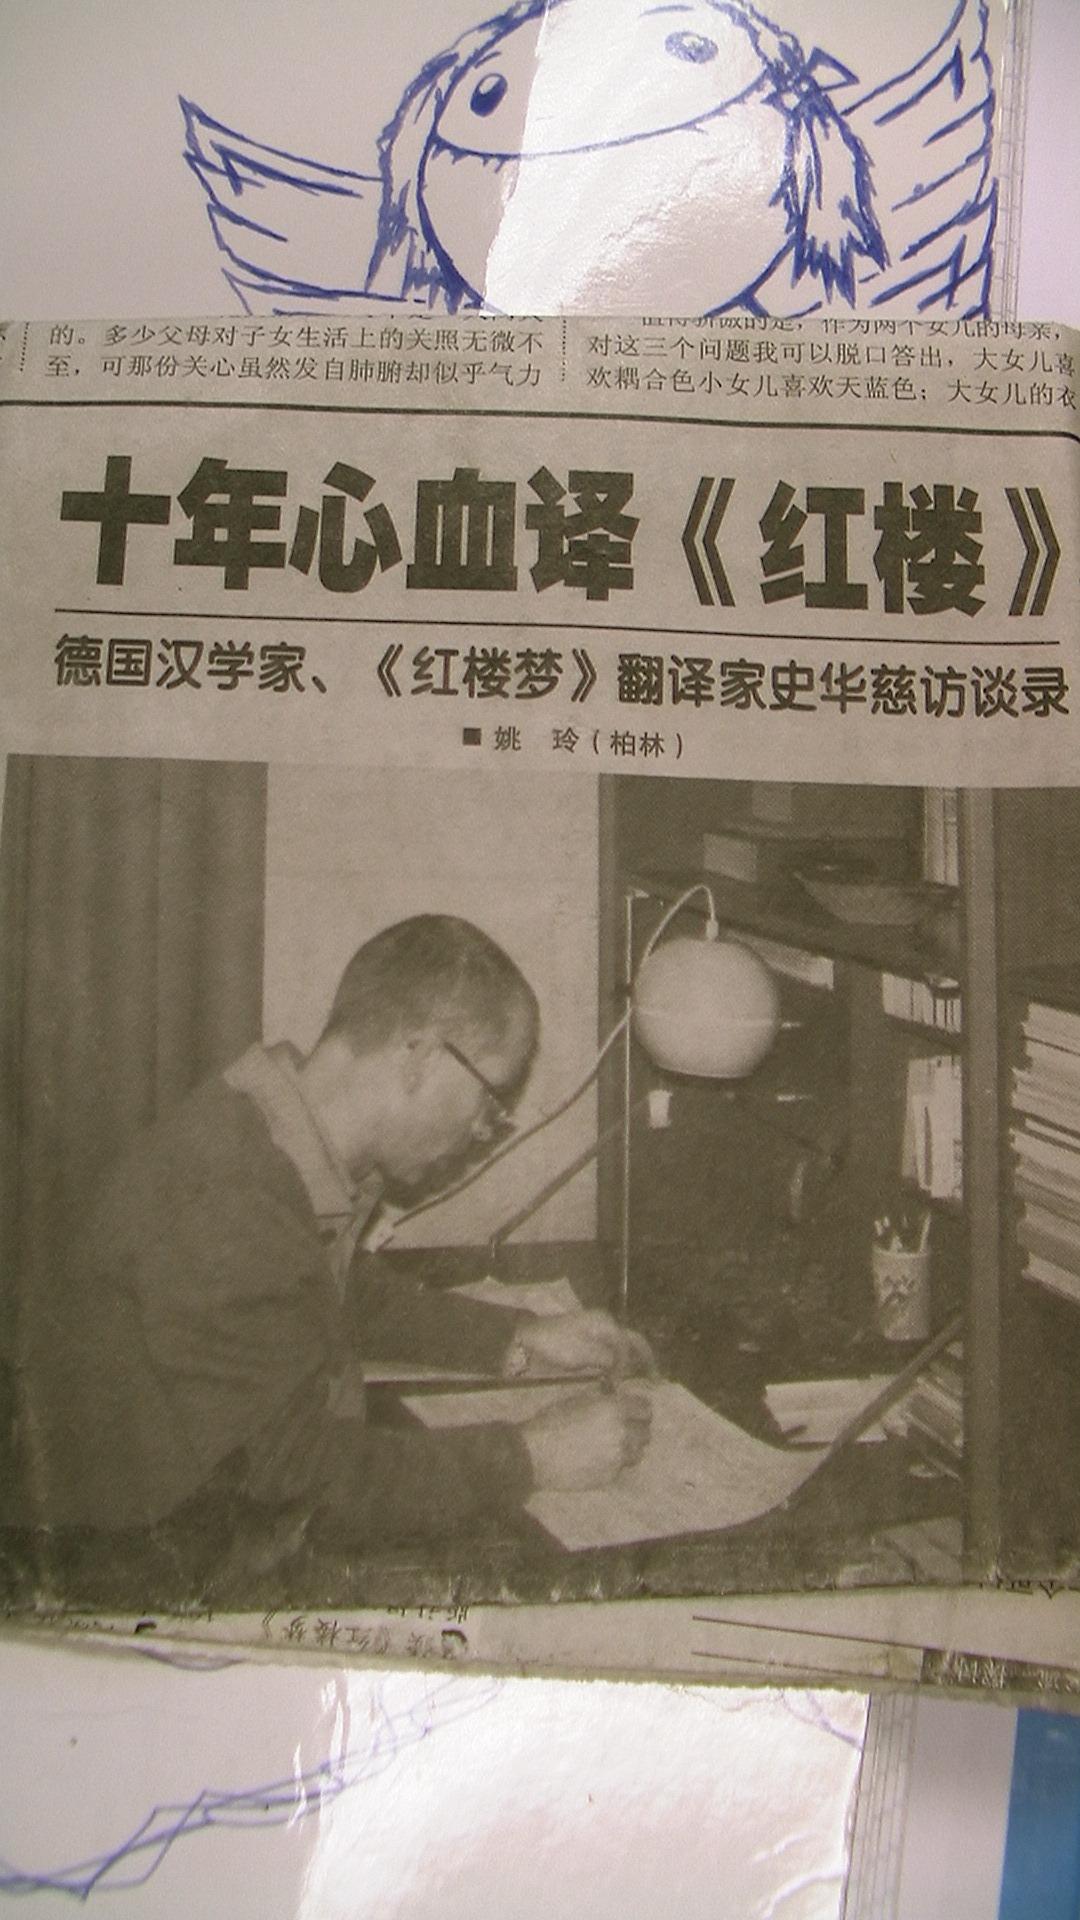 Shi Huaxi at work translating Cao Xueqin in East Berlin